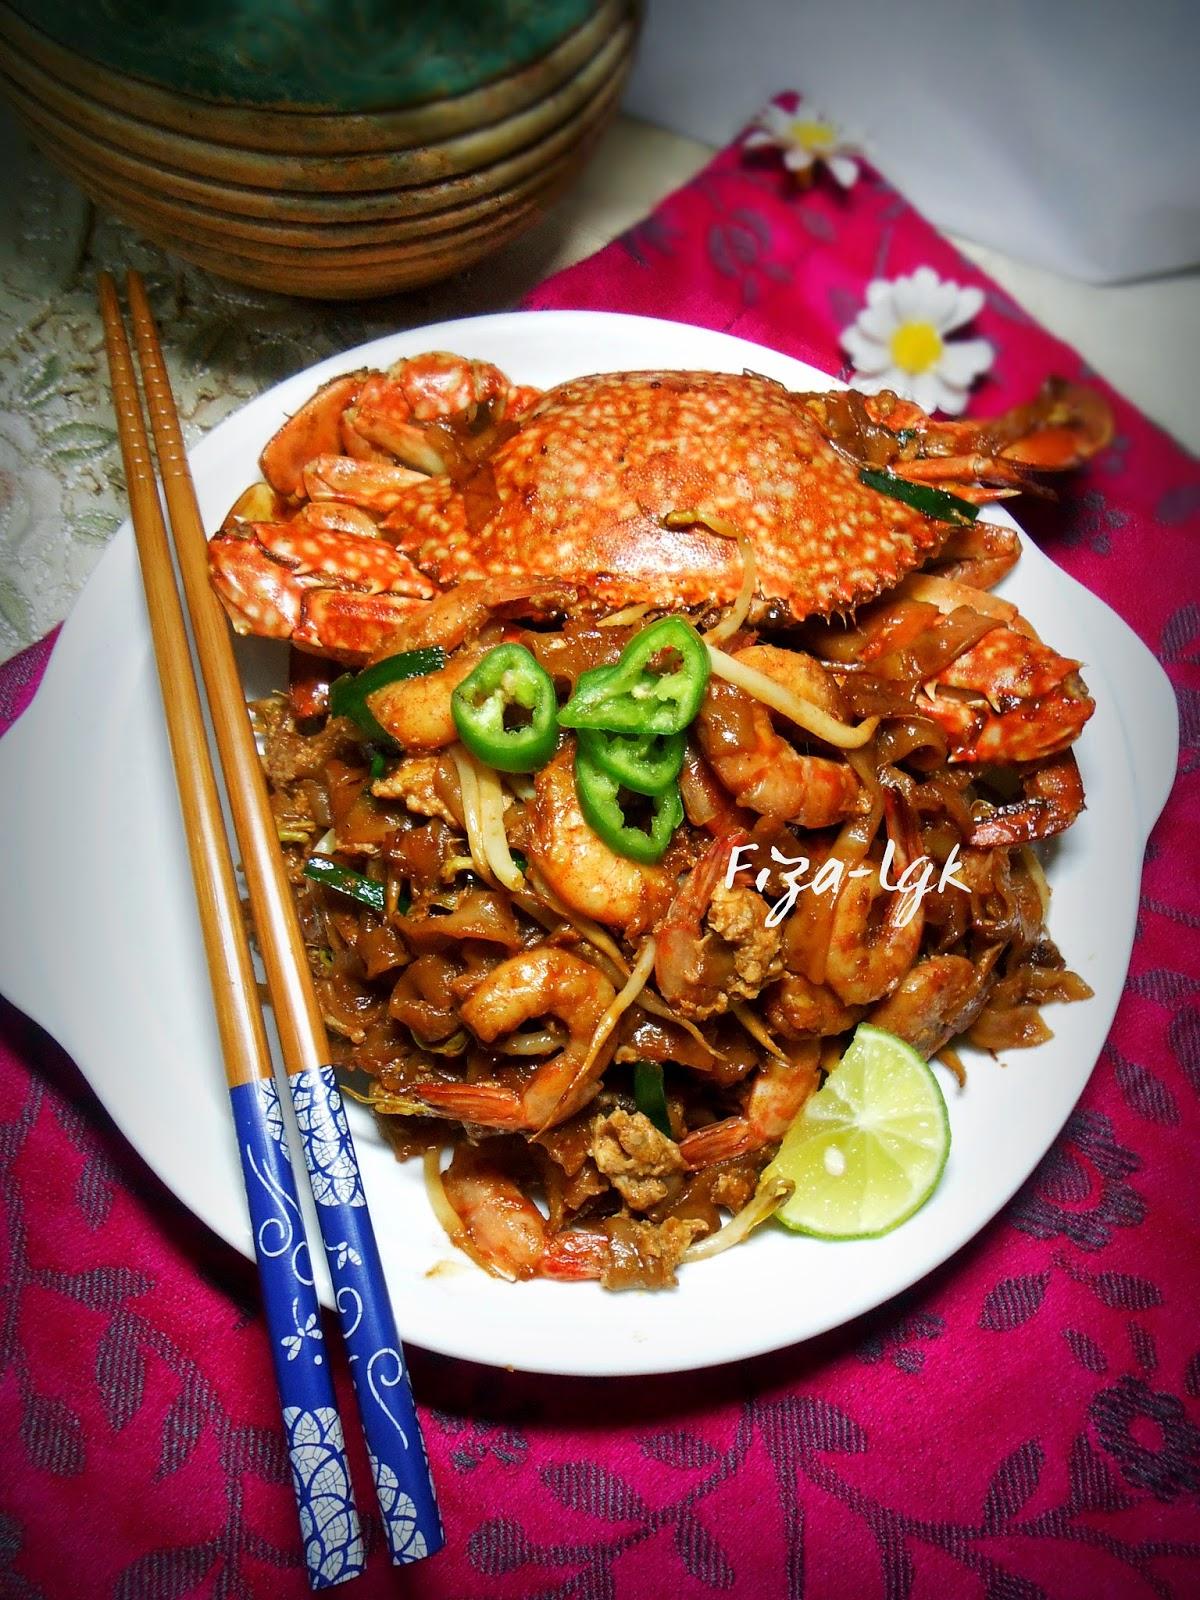 KUE TEOW GORENG SEAFOOD YANG SEDAP | Fiza's Cooking